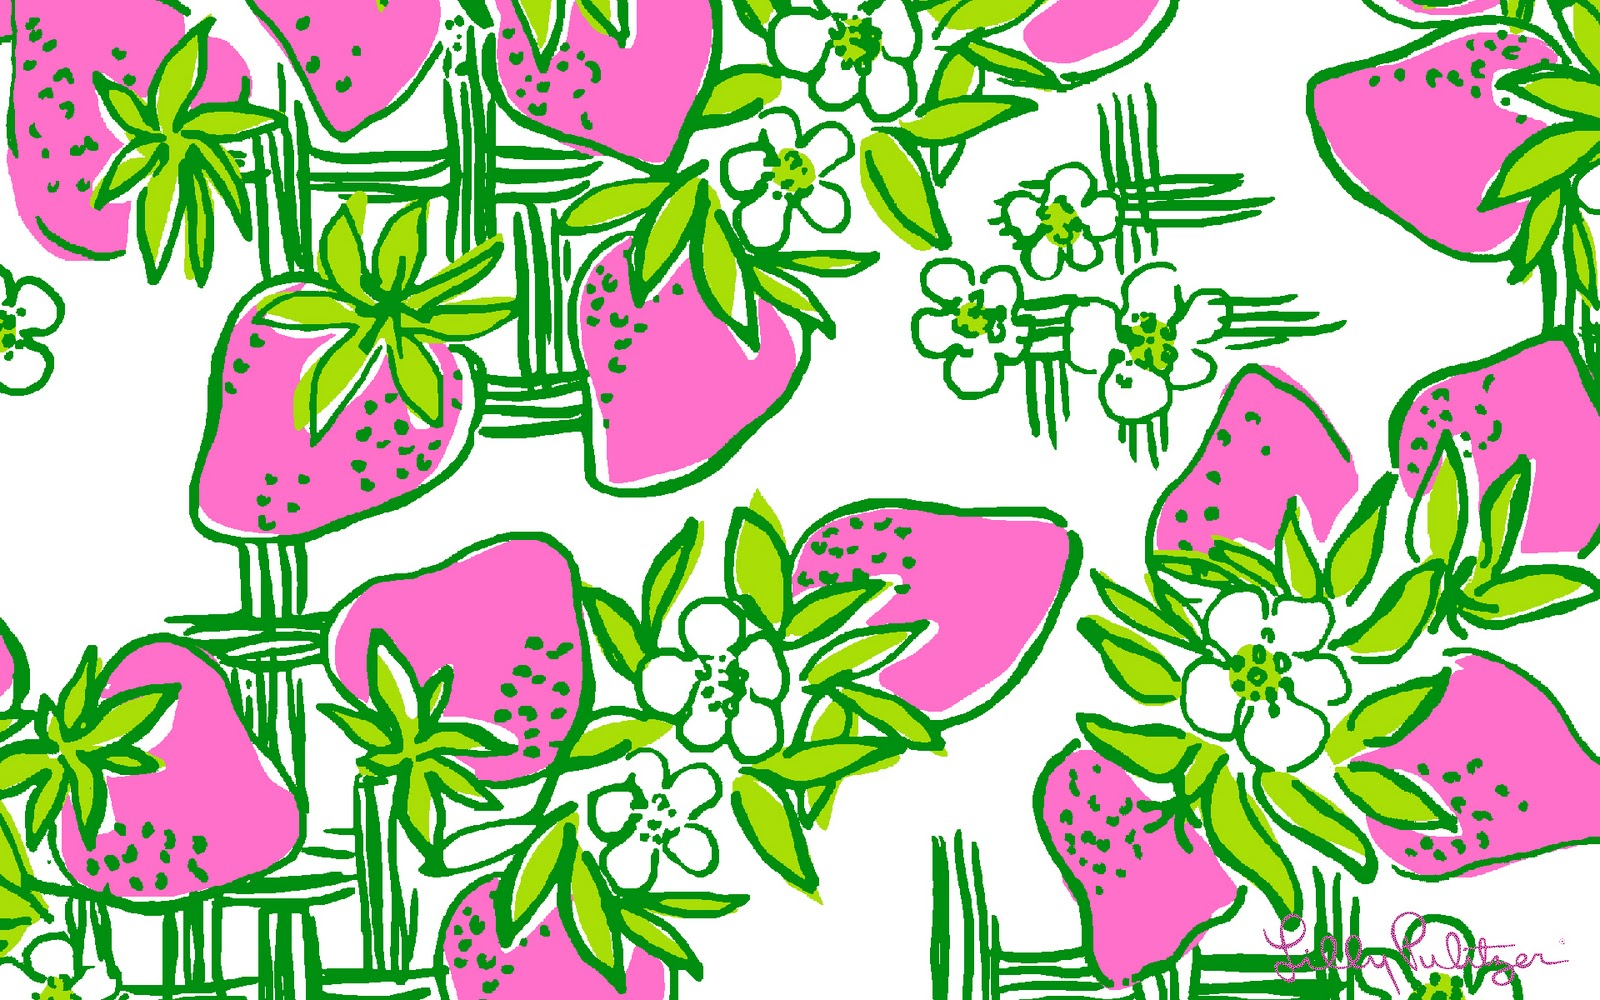 CanadianPrep-Lilly-Desktop-wallpaper-wp5001780